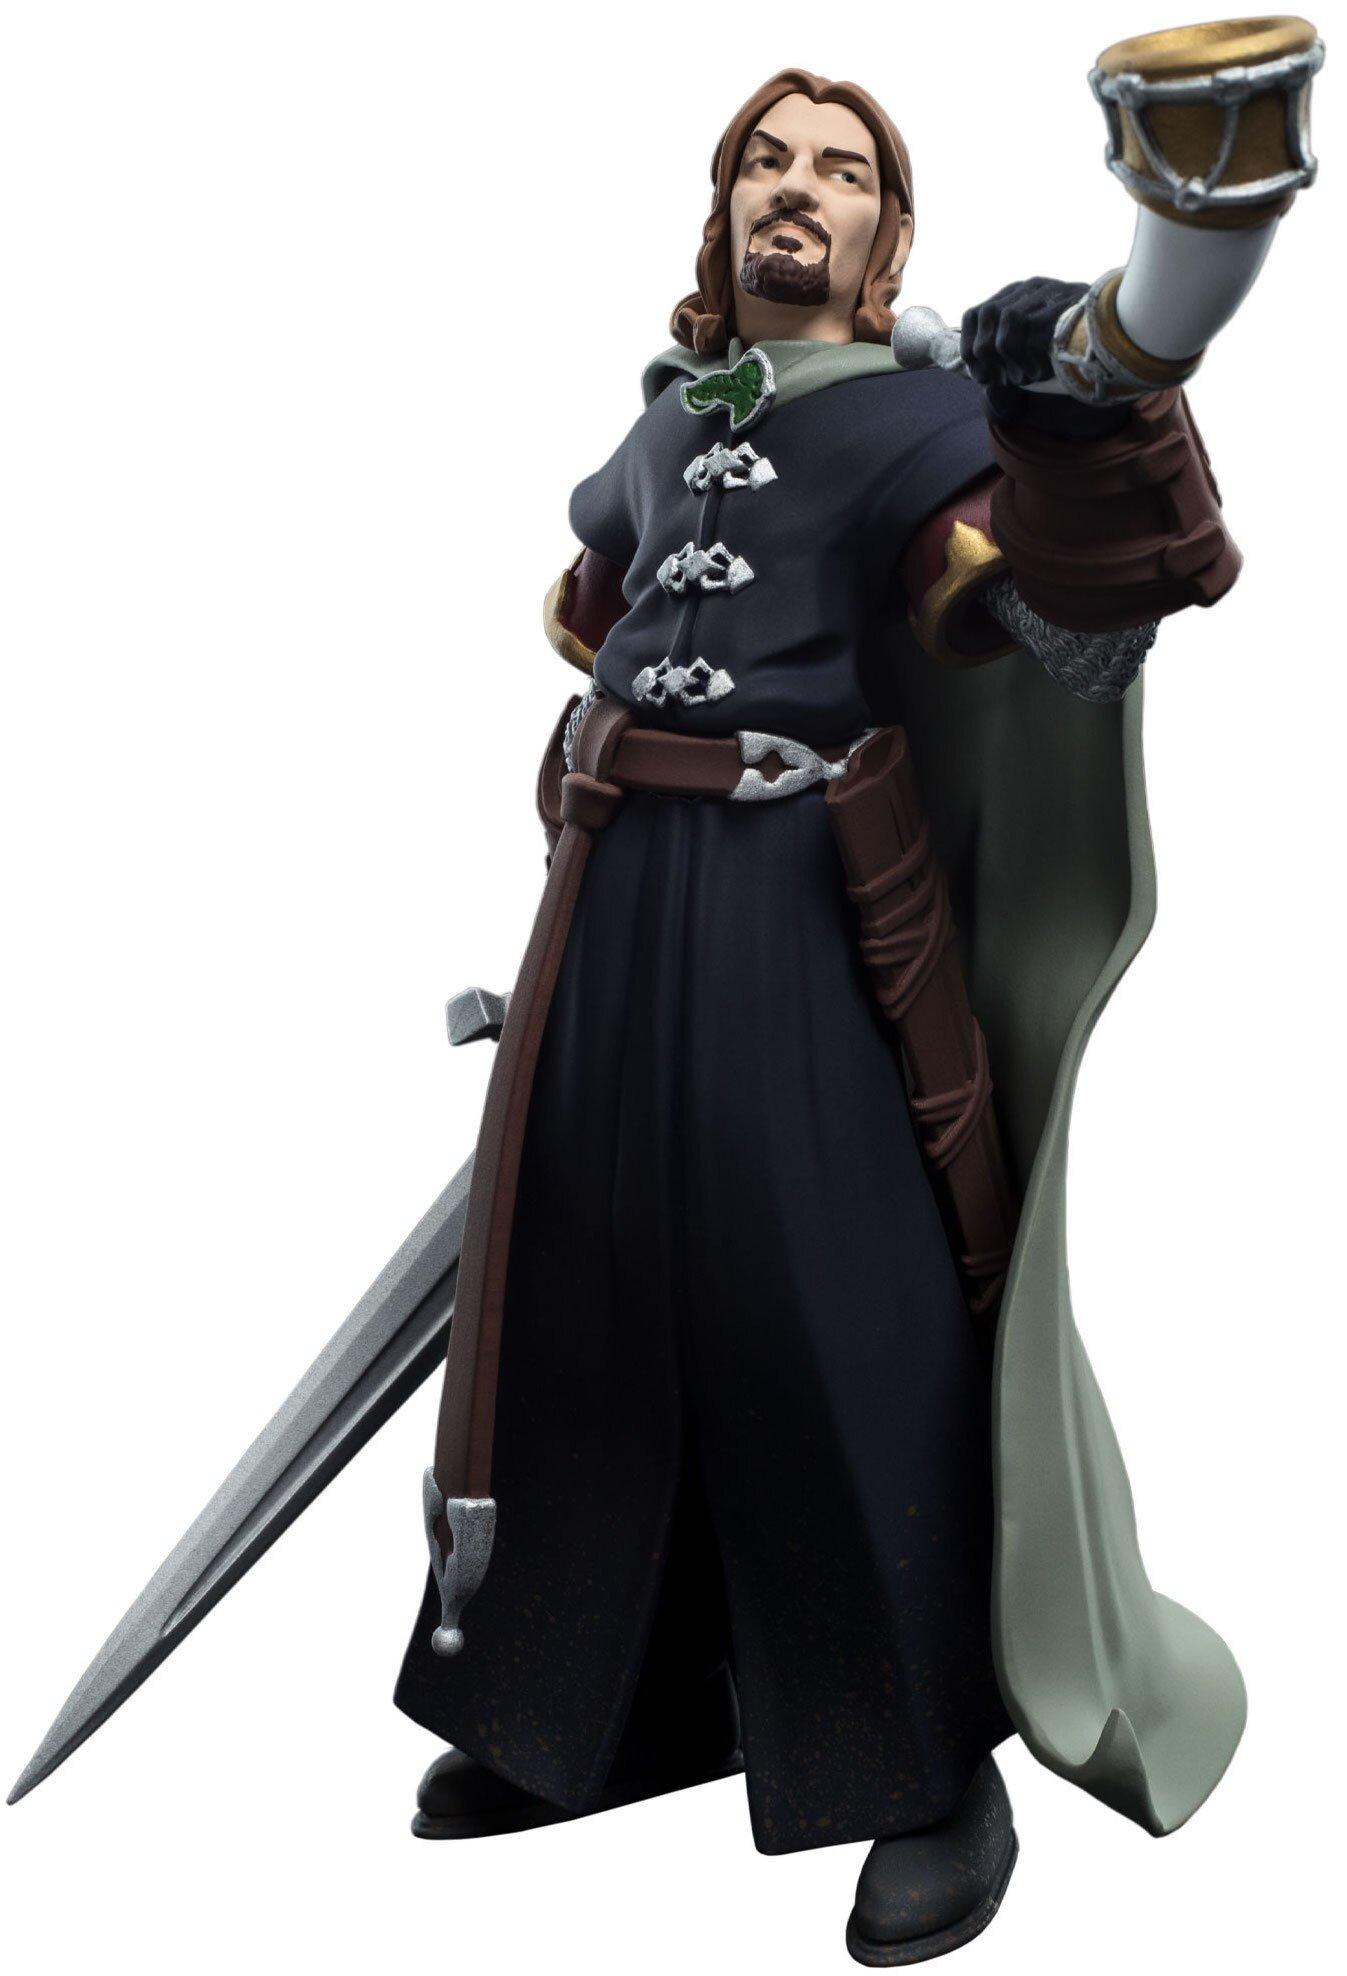 Lord of the Rings Mini Epics - Boromir